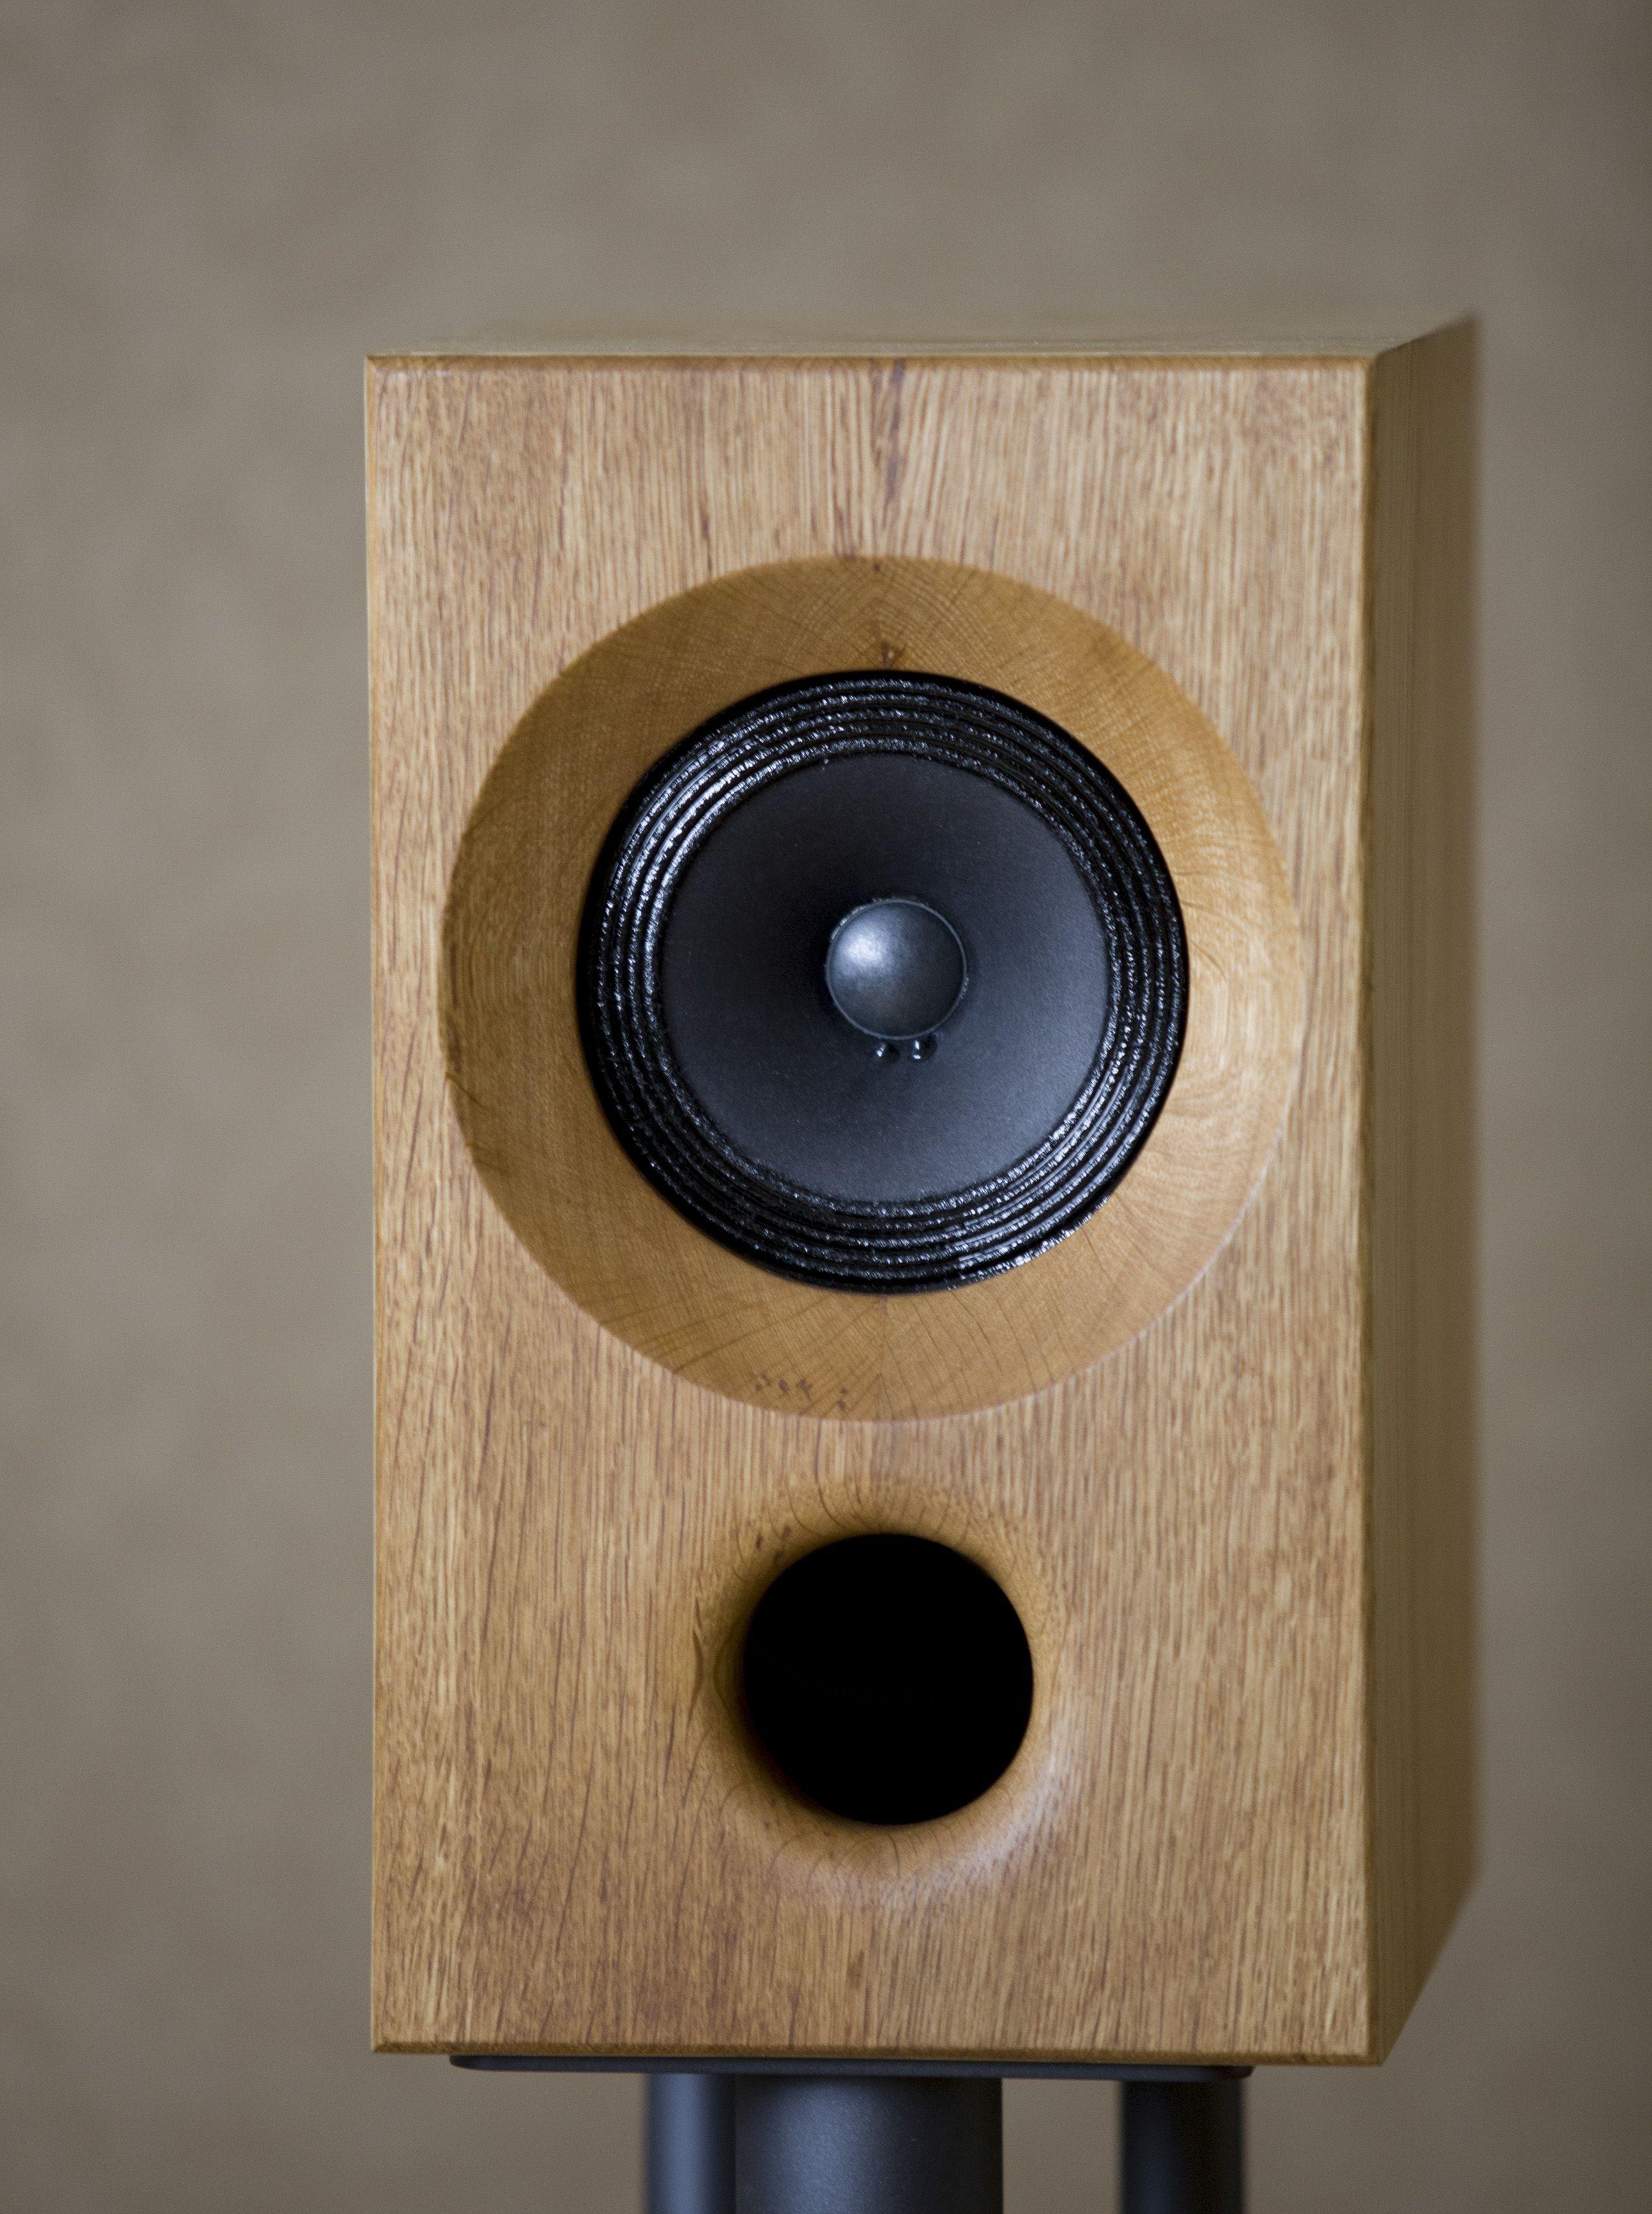 bookshelf speaker design에 대한 이미지 검색결과 Luidspreker, Idee